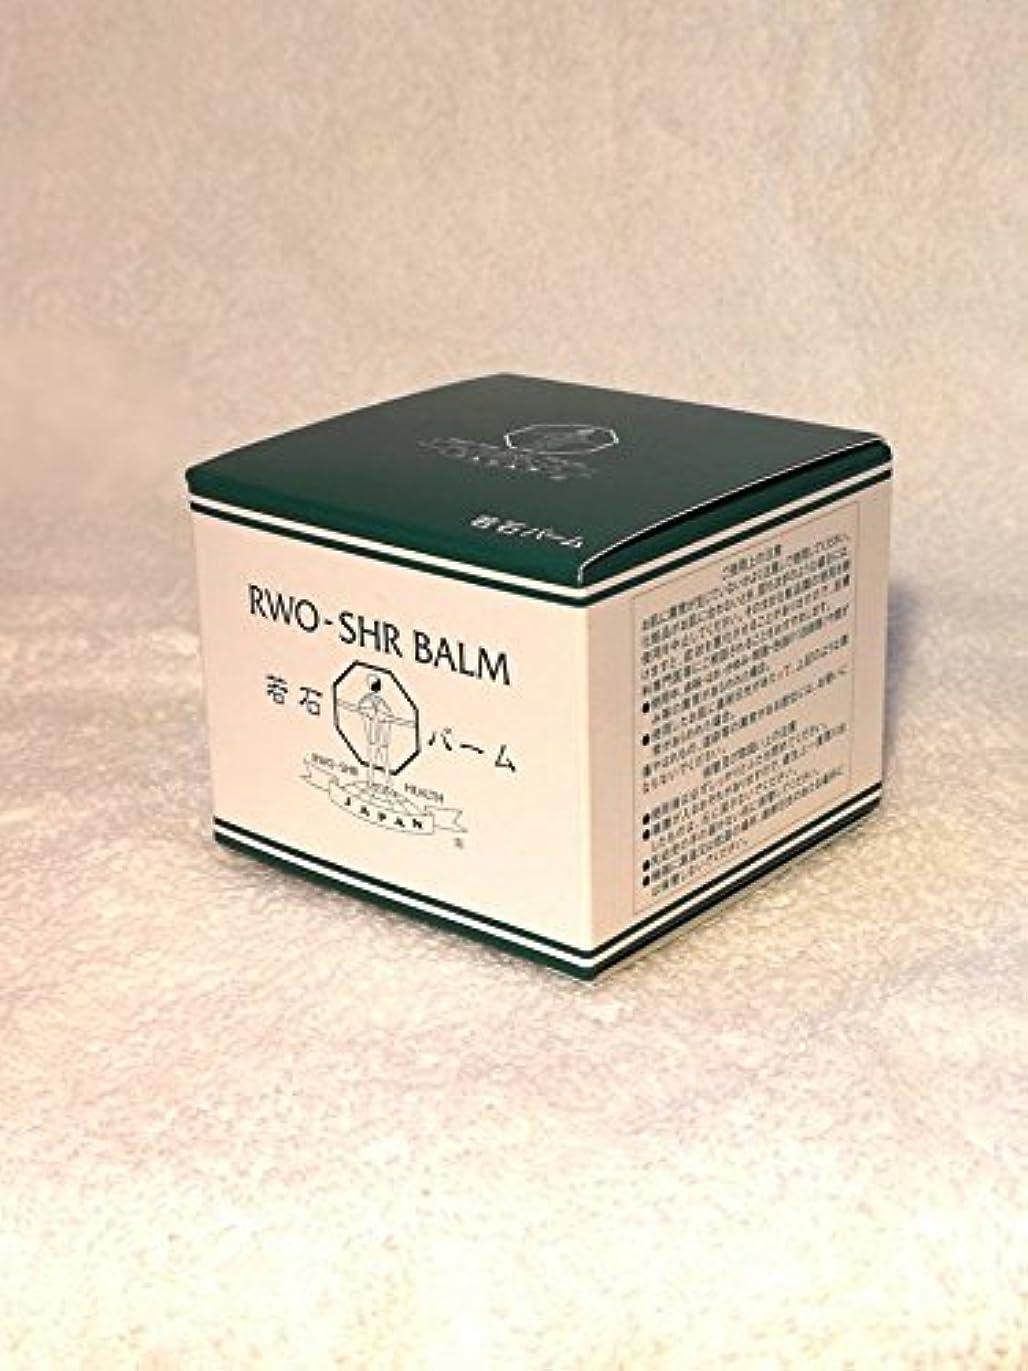 テザー細部一過性若石バーム(業務用)足部専用クリーム 若石健康法正規品 (50g)